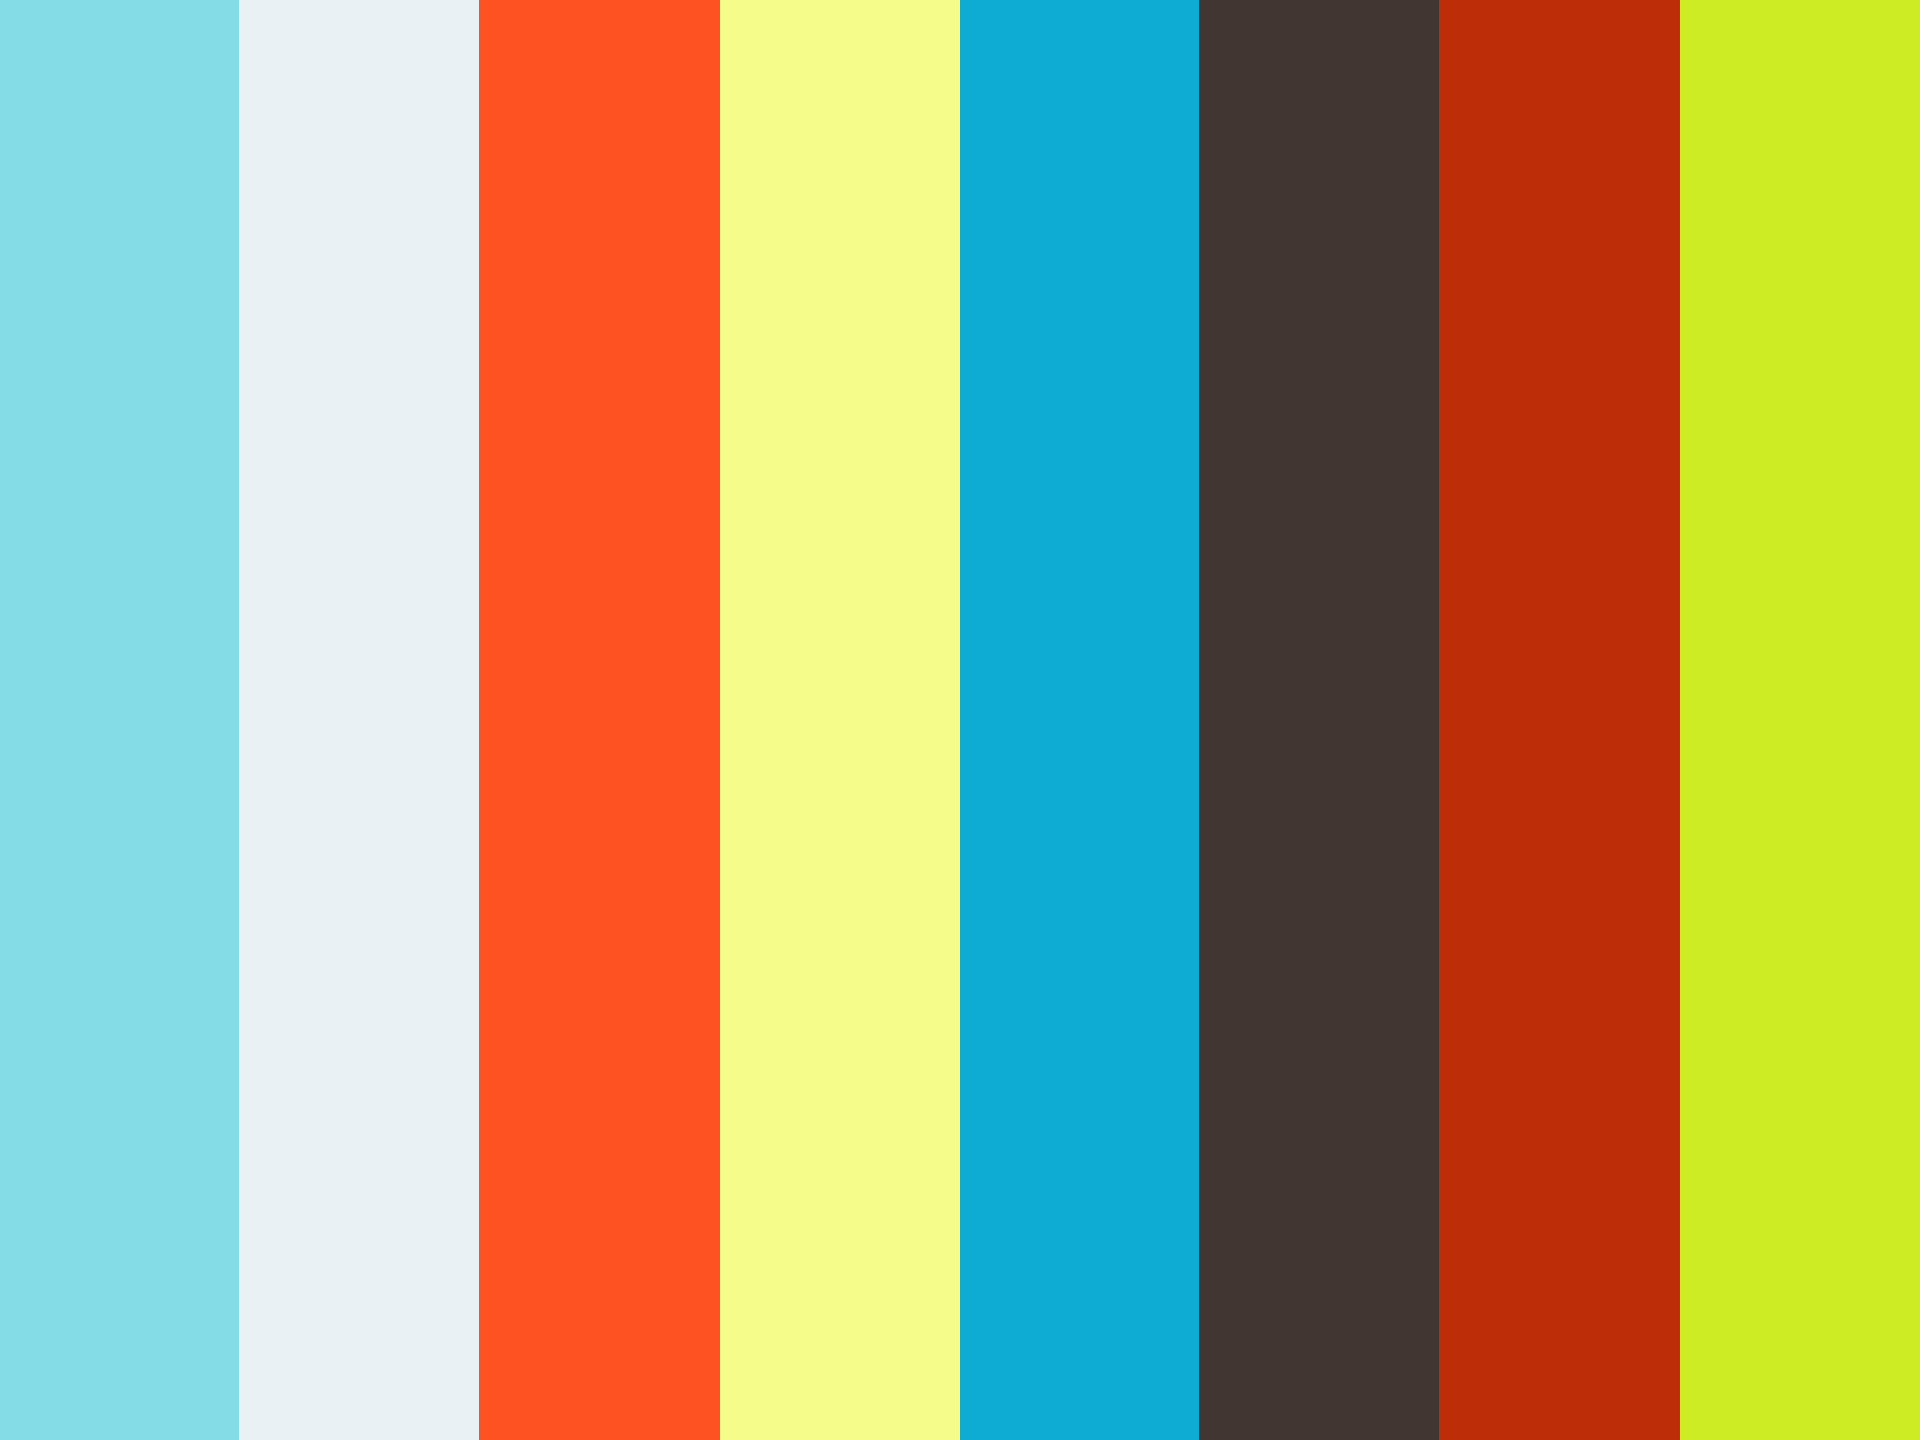 【LIVE配信】「いまこそ知りたい! 口腔がん」柴原孝彦先生クリニカル・カンファレンス